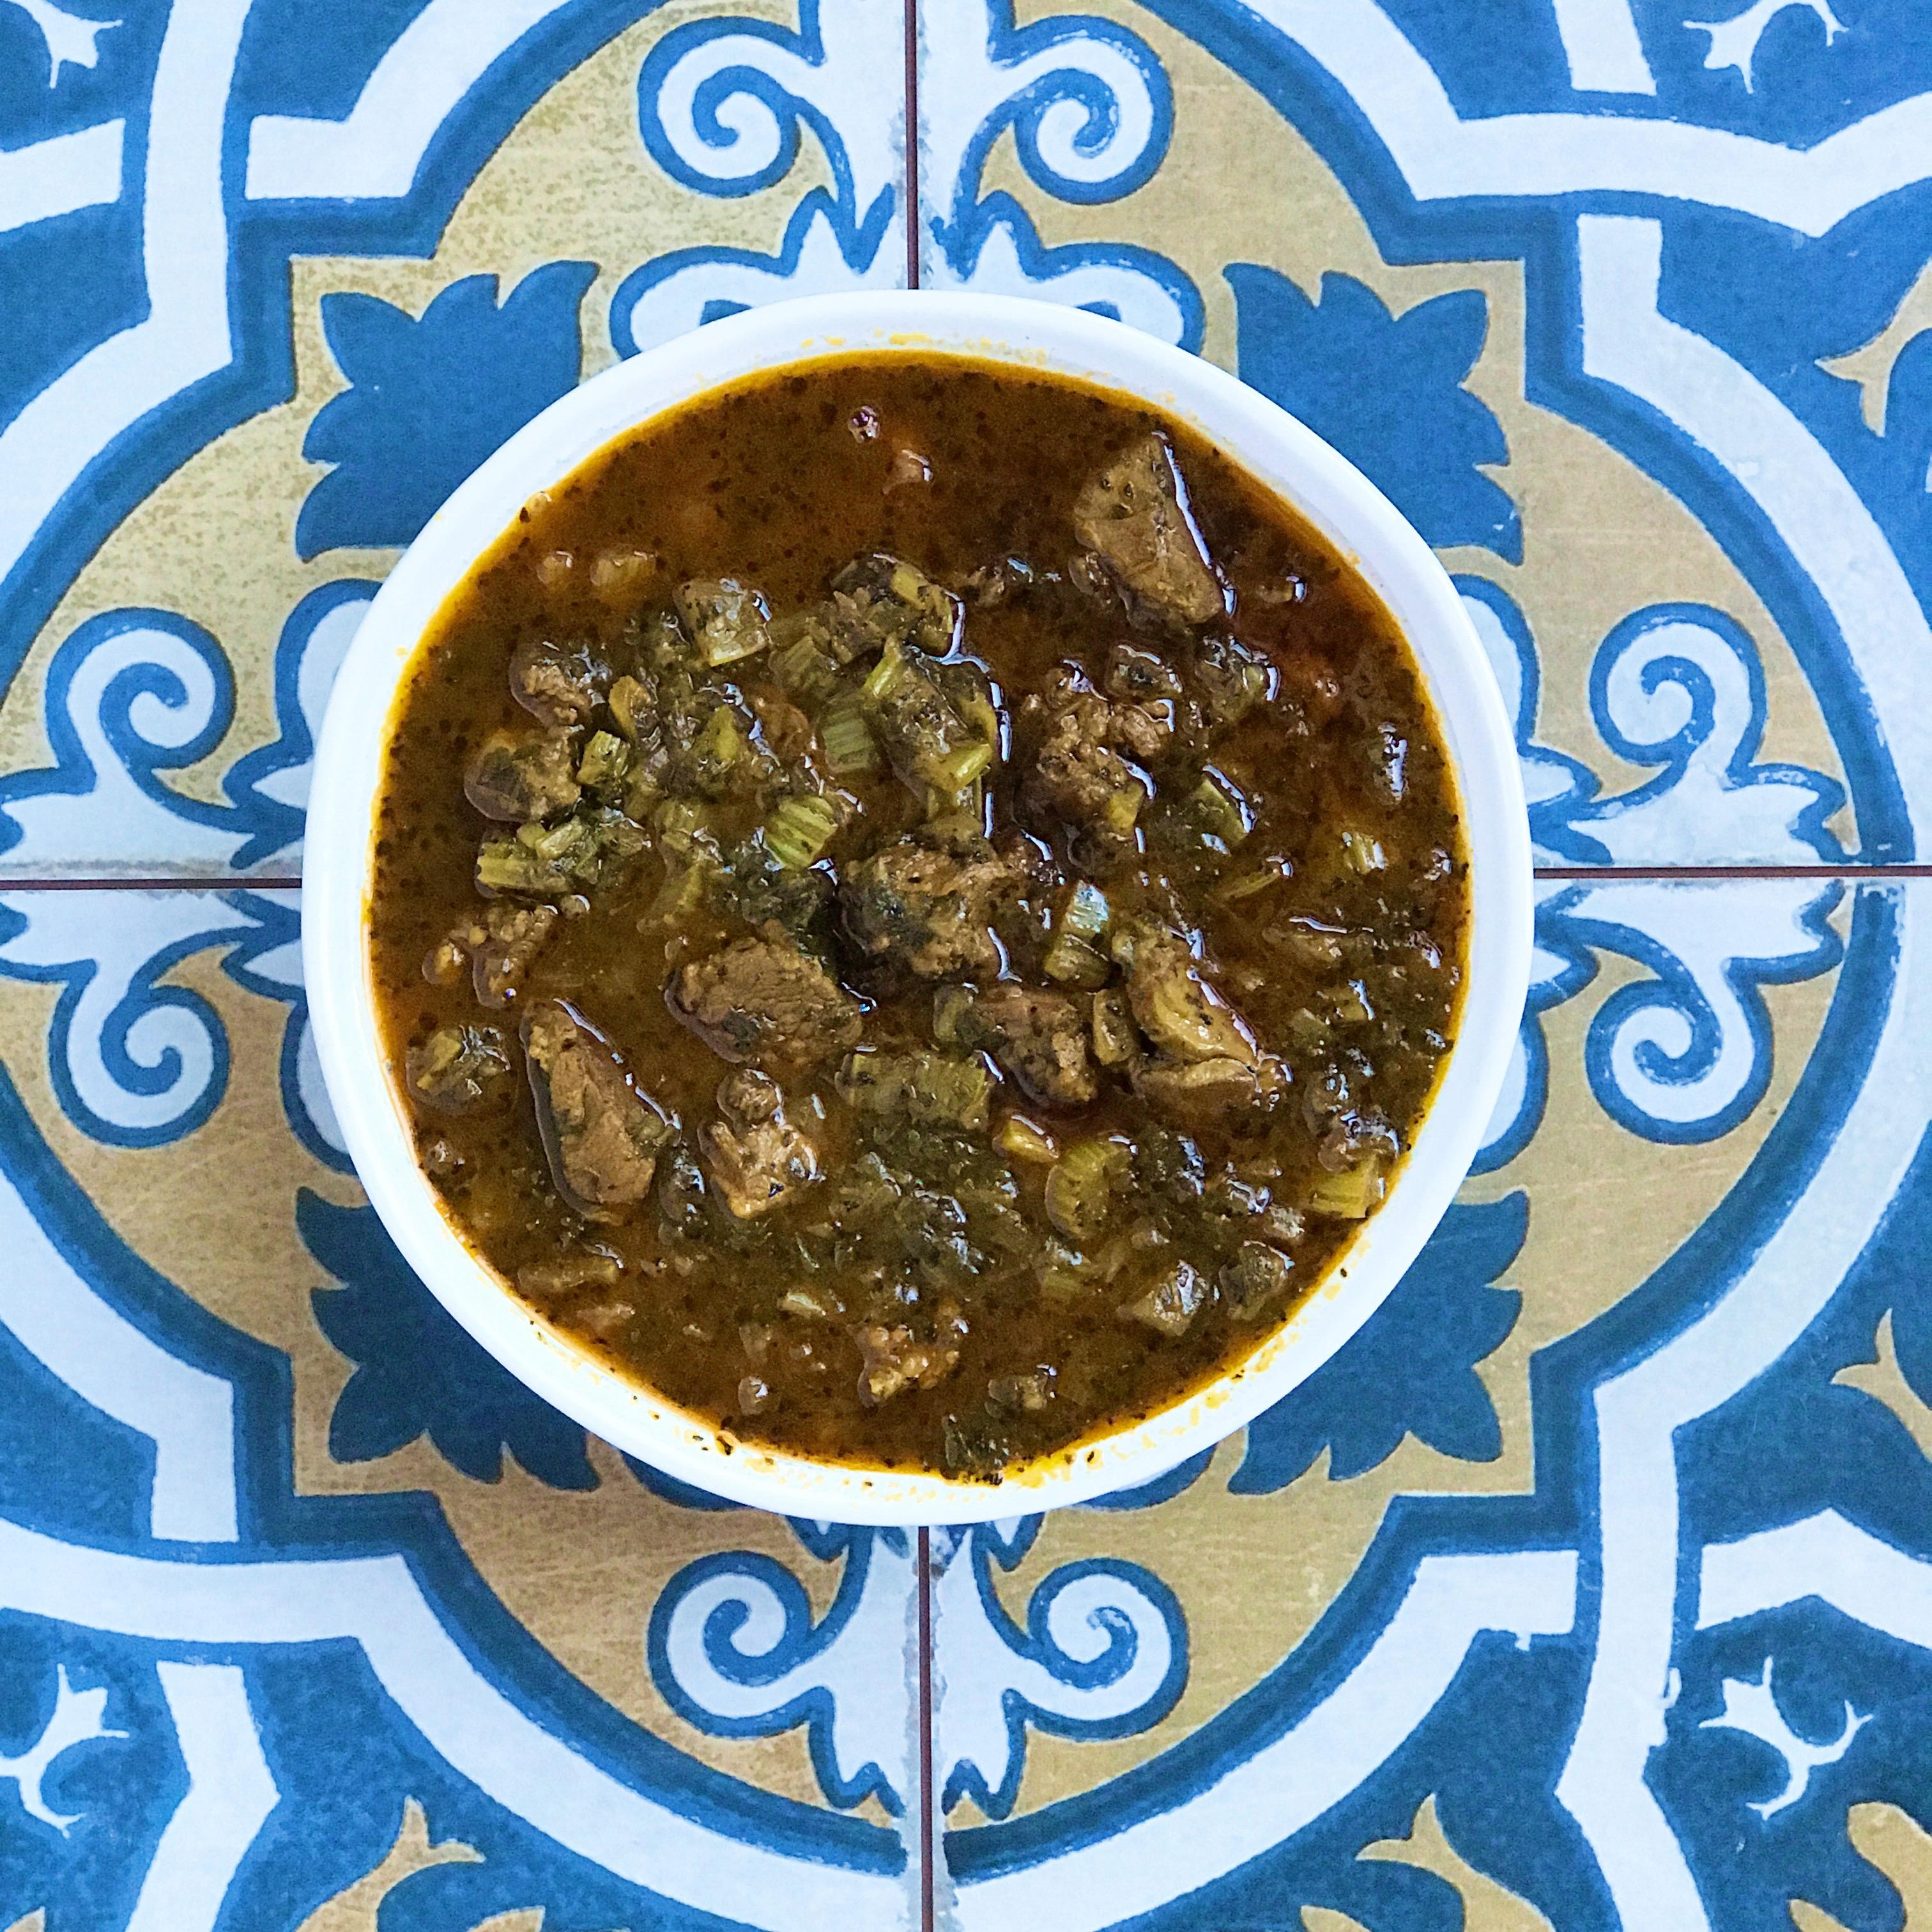 khoresht karafs in a bowl